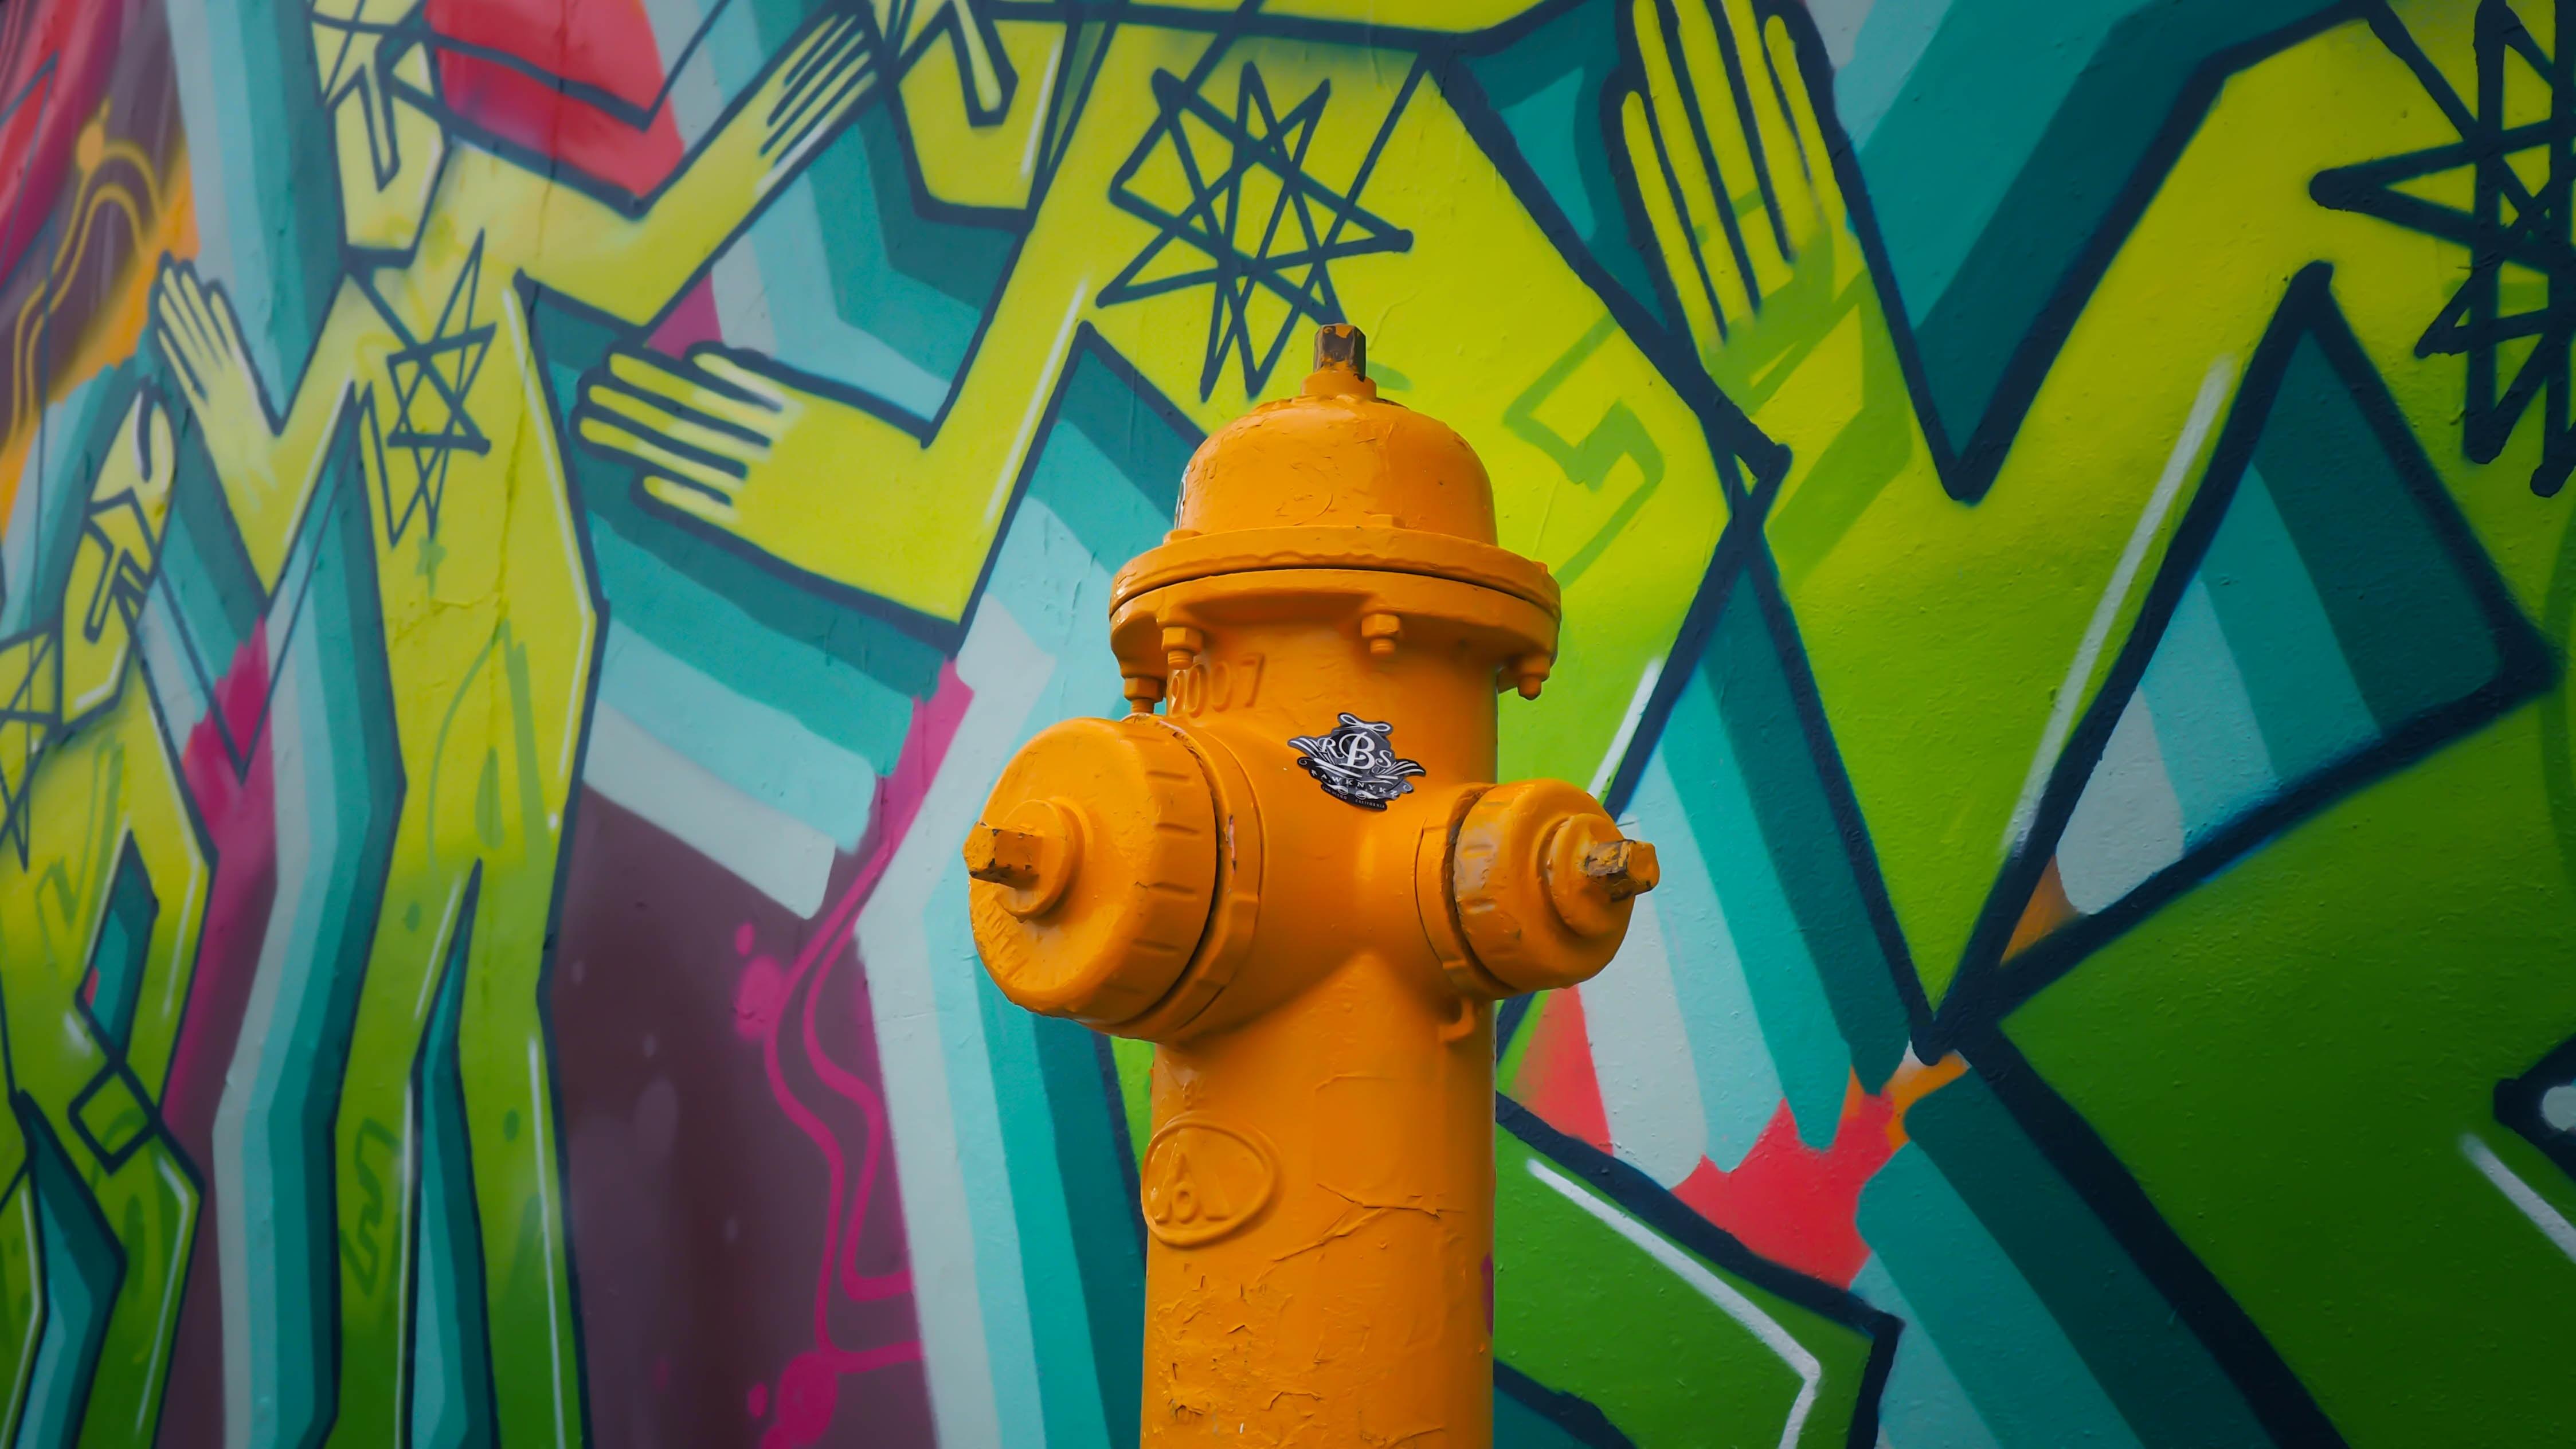 orange fire hydrant near mural wall